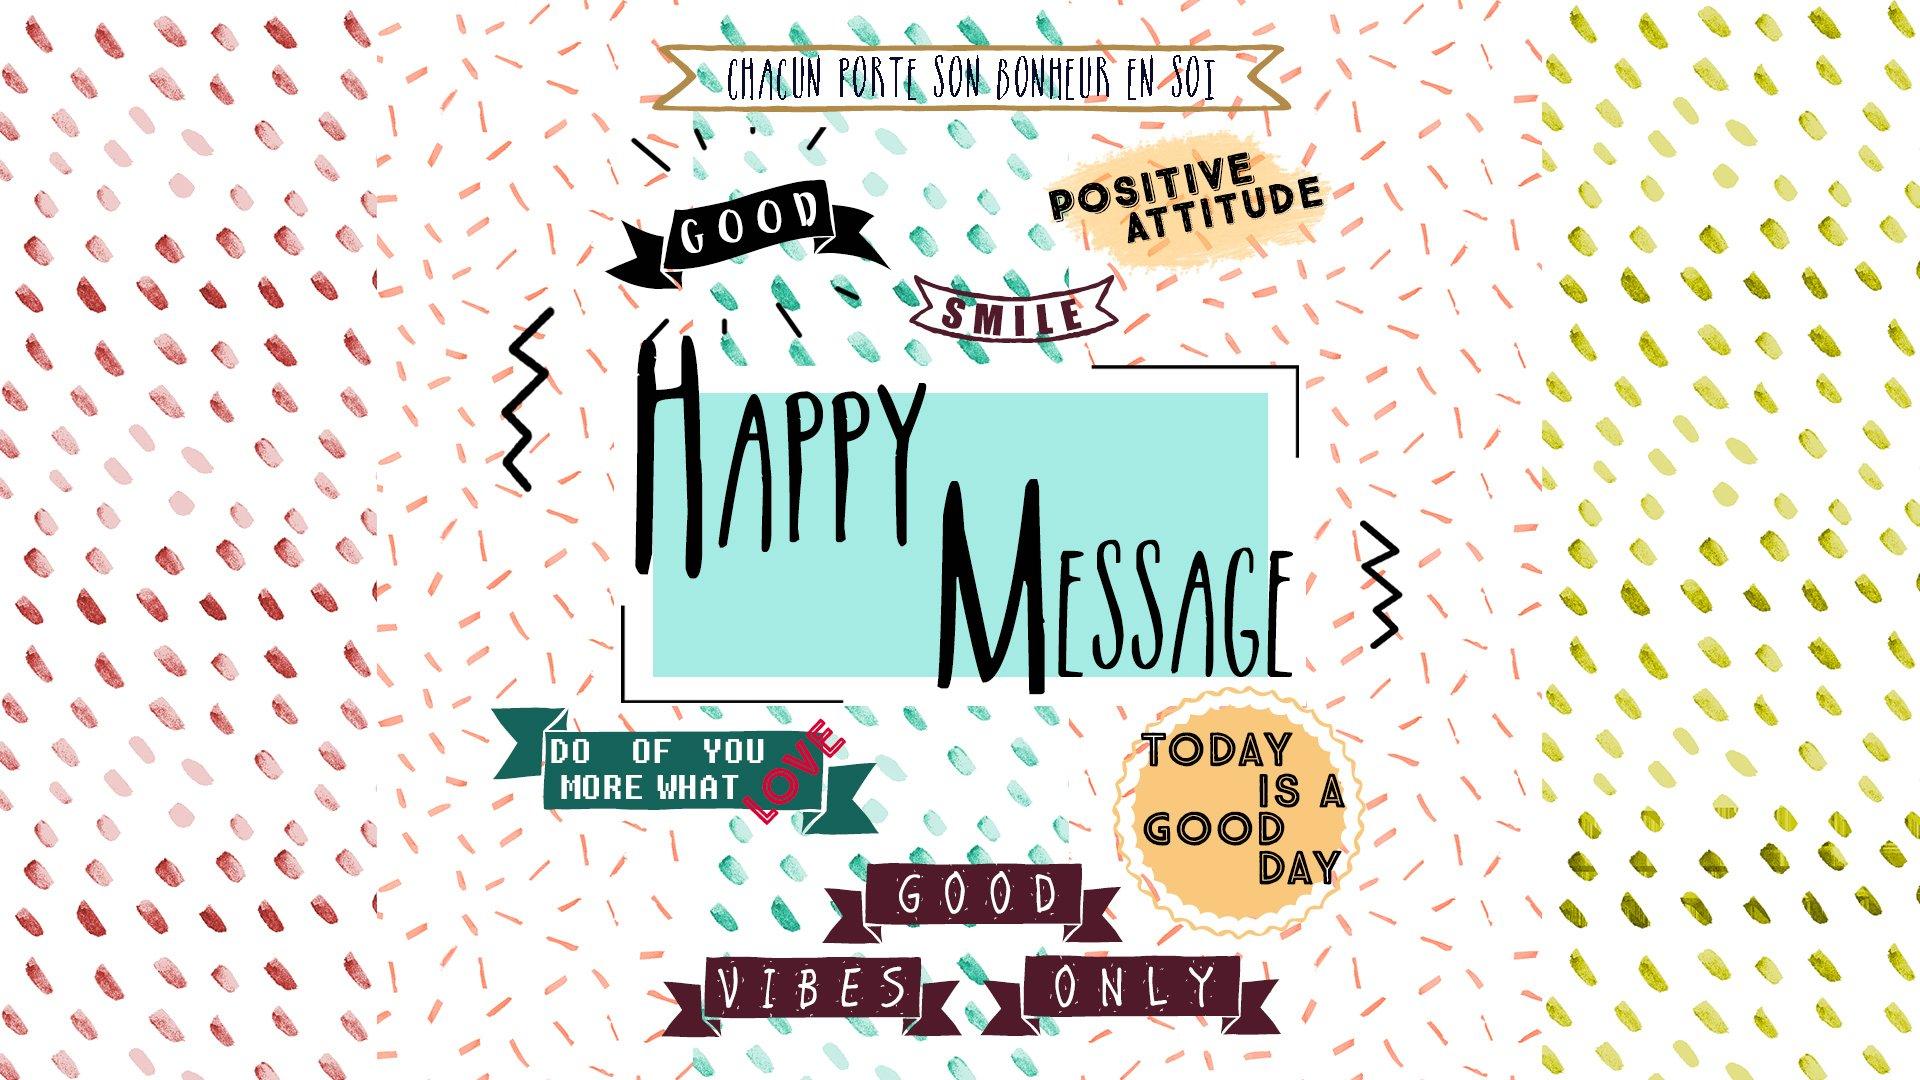 OK-happy-message_fondecran_1920x1080